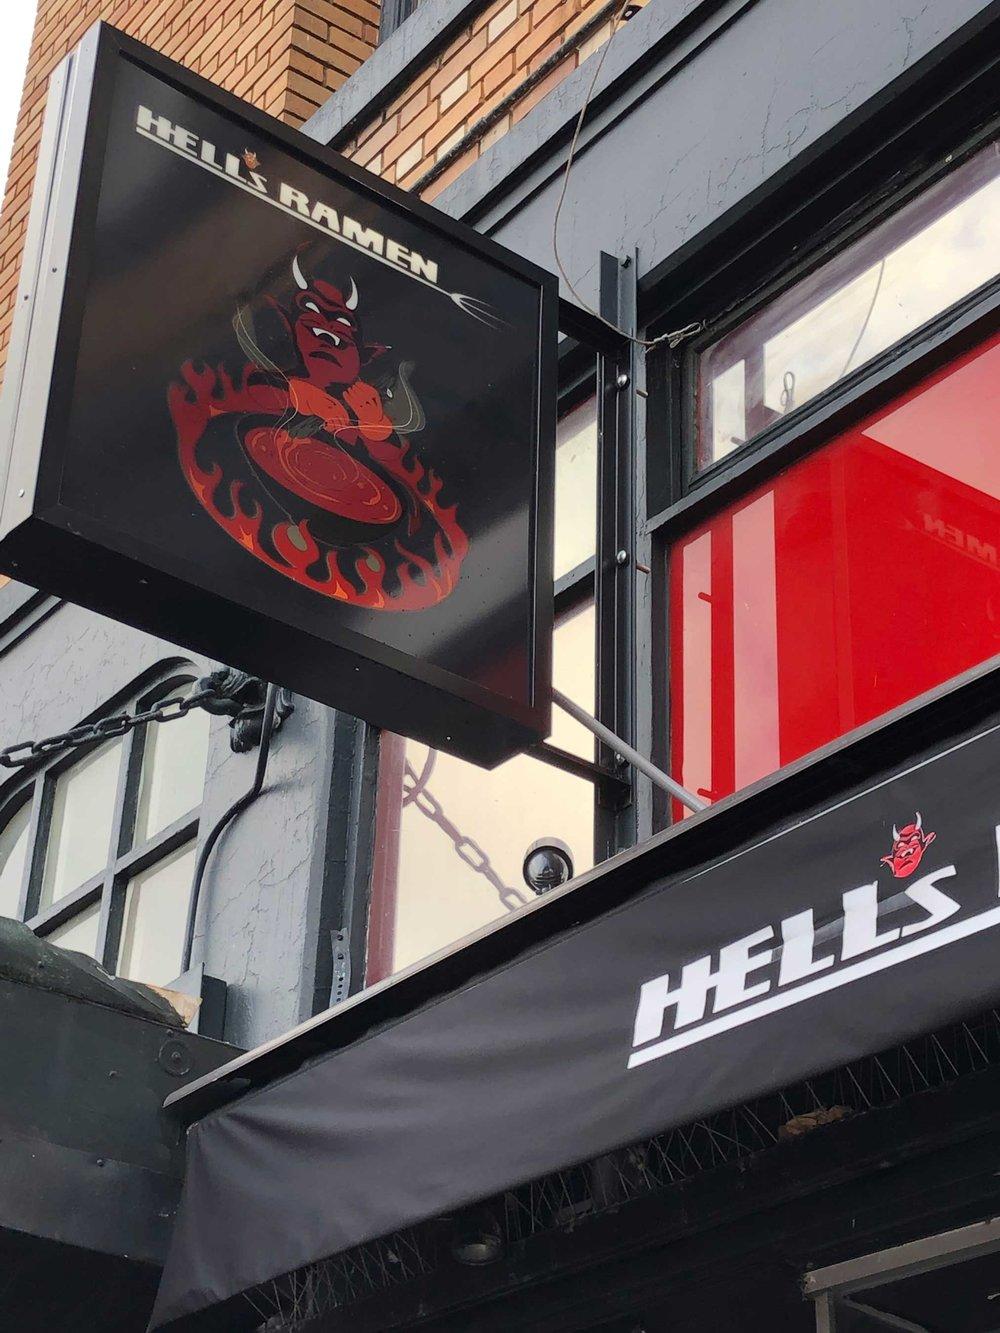 Hells-Ramen-San-Francisco-2.jpg